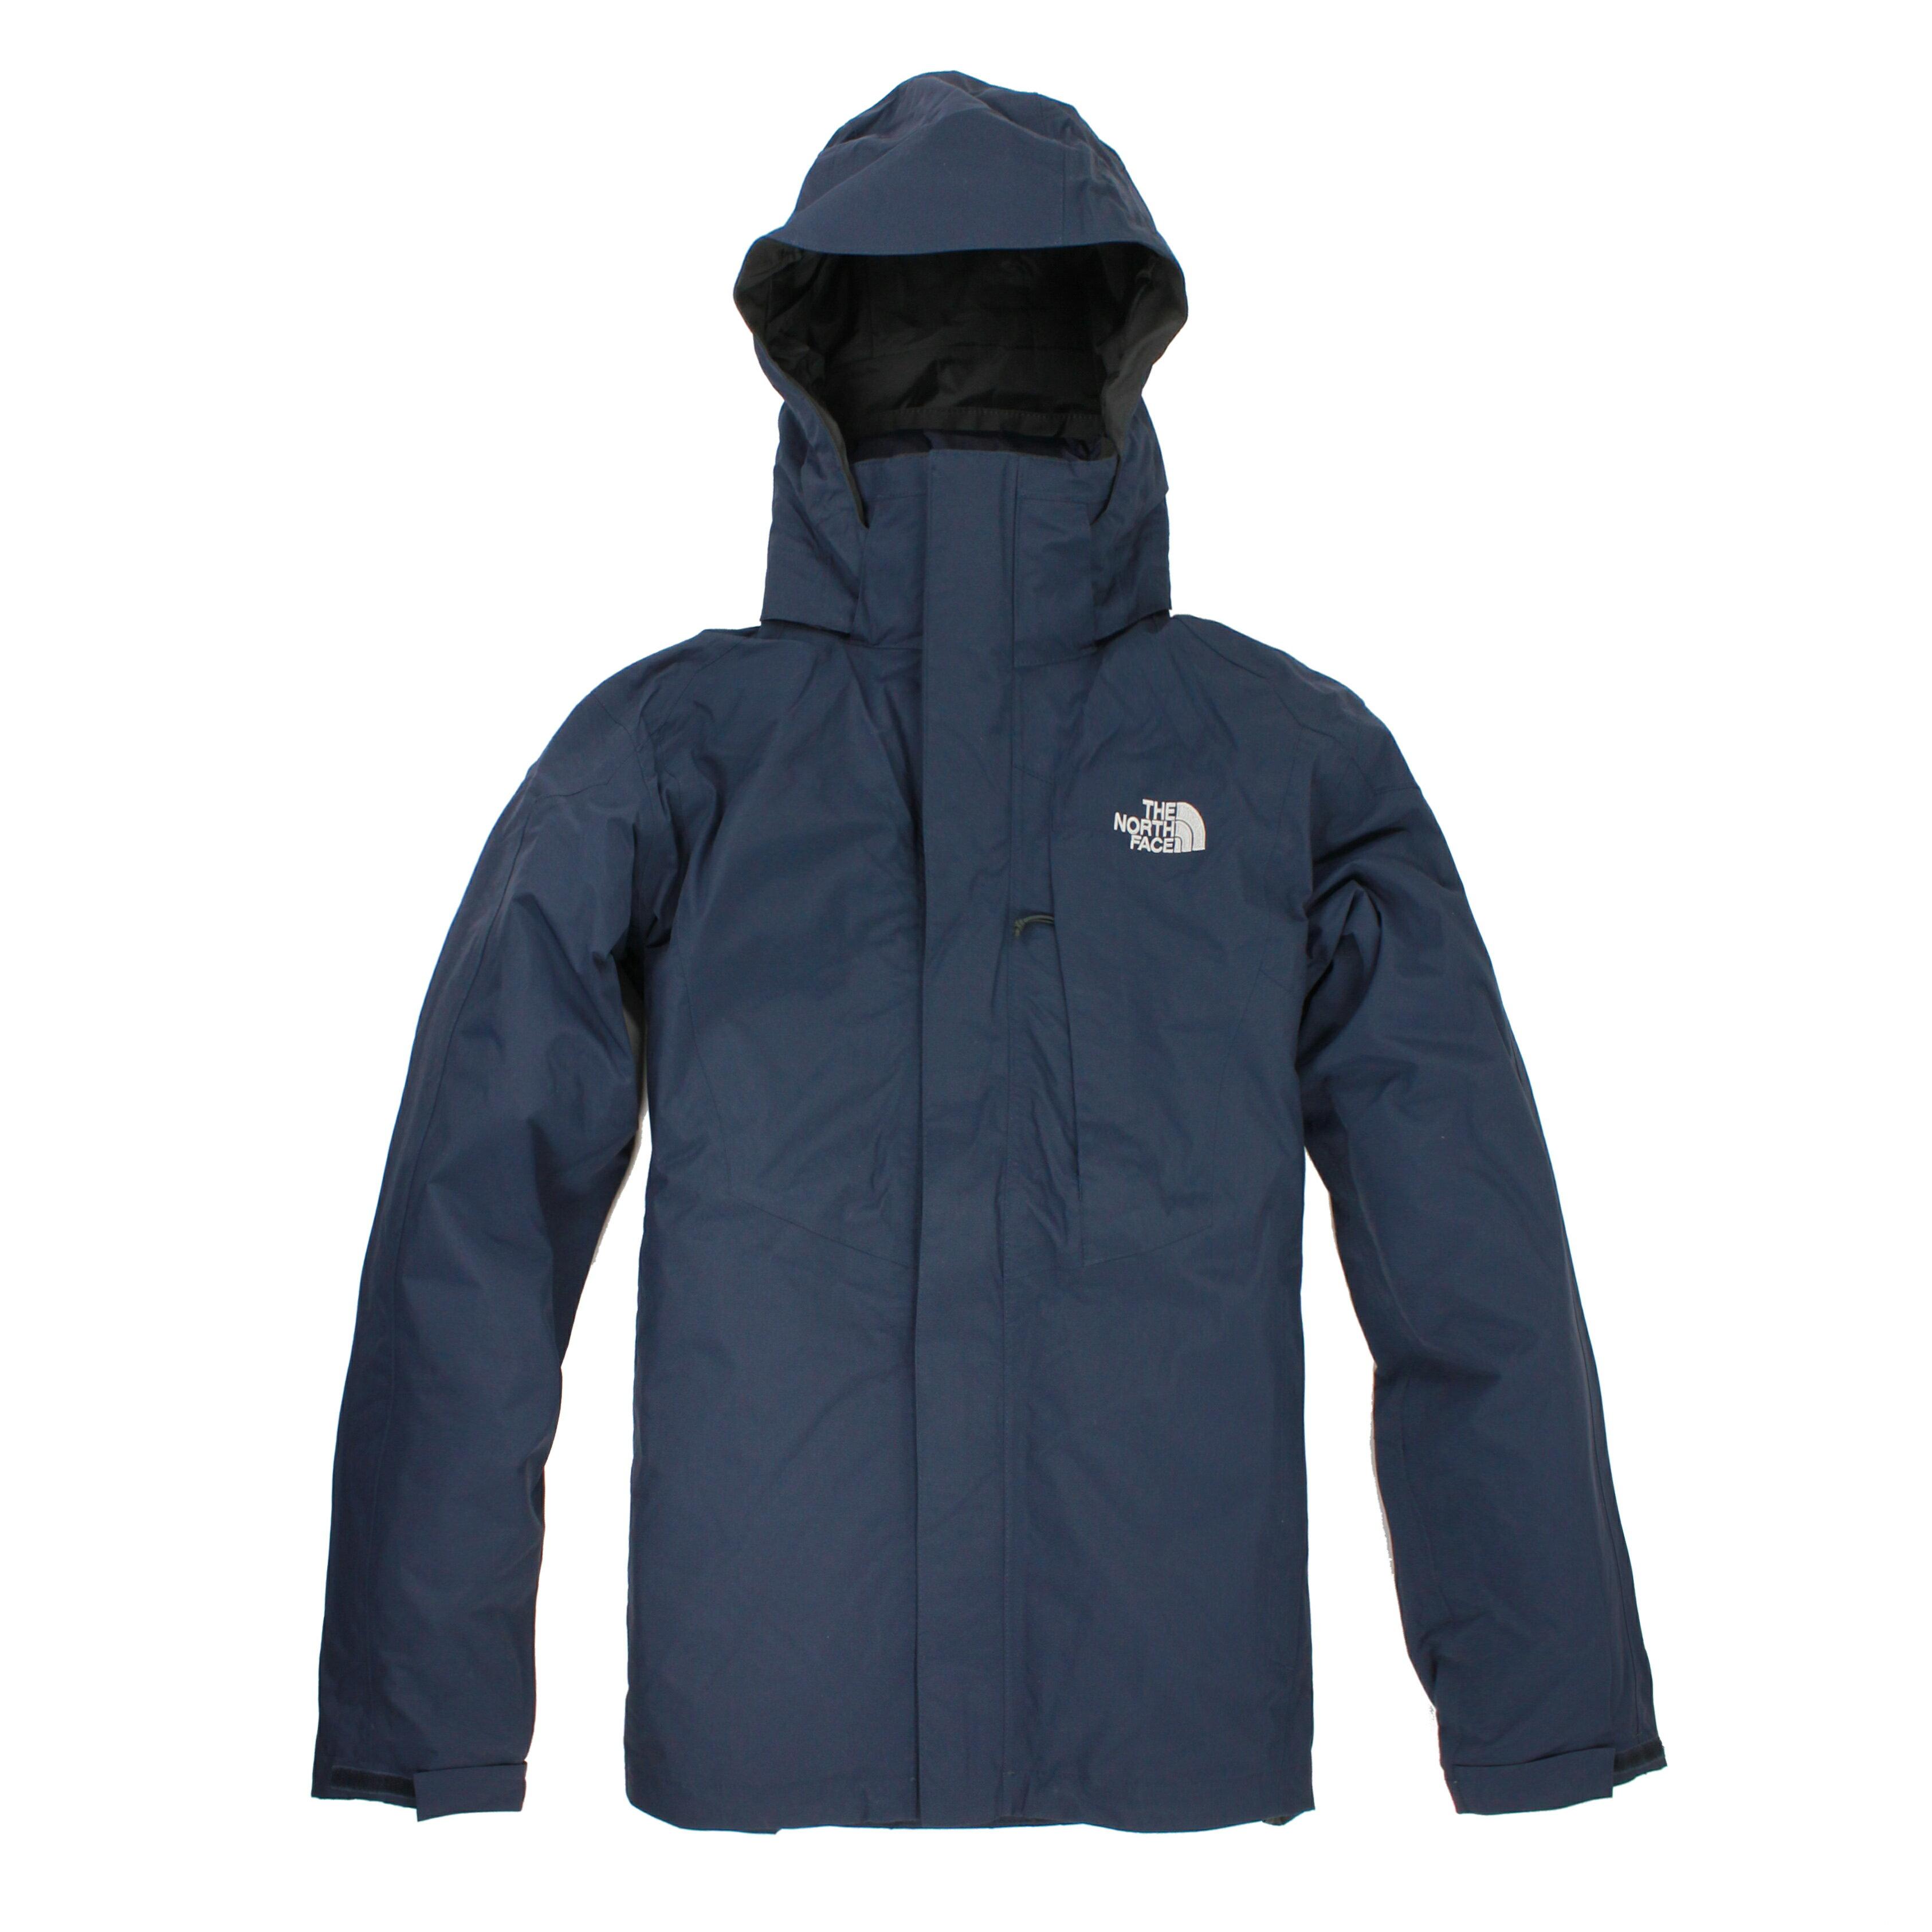 美國百分百【The North Face 】外套 TNF 夾克 防水 北臉 兩件式 S M L XL 深藍 E288